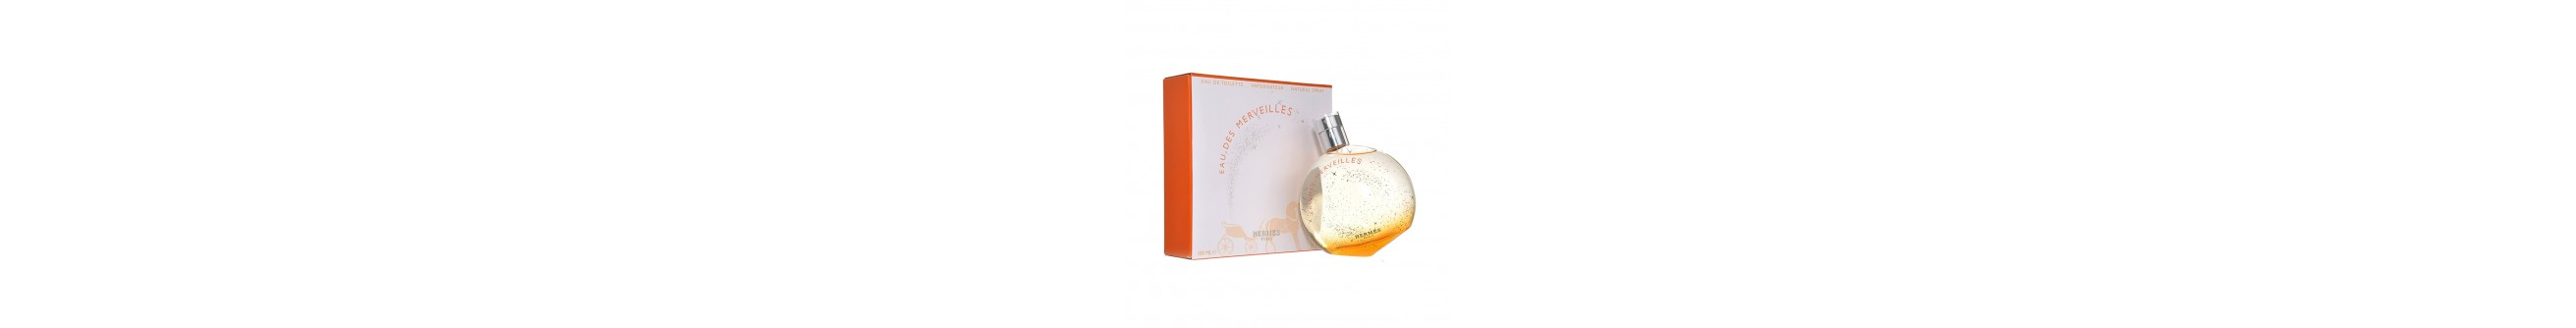 Eau De Merveilles - Hermes (άρωμα τύπου)